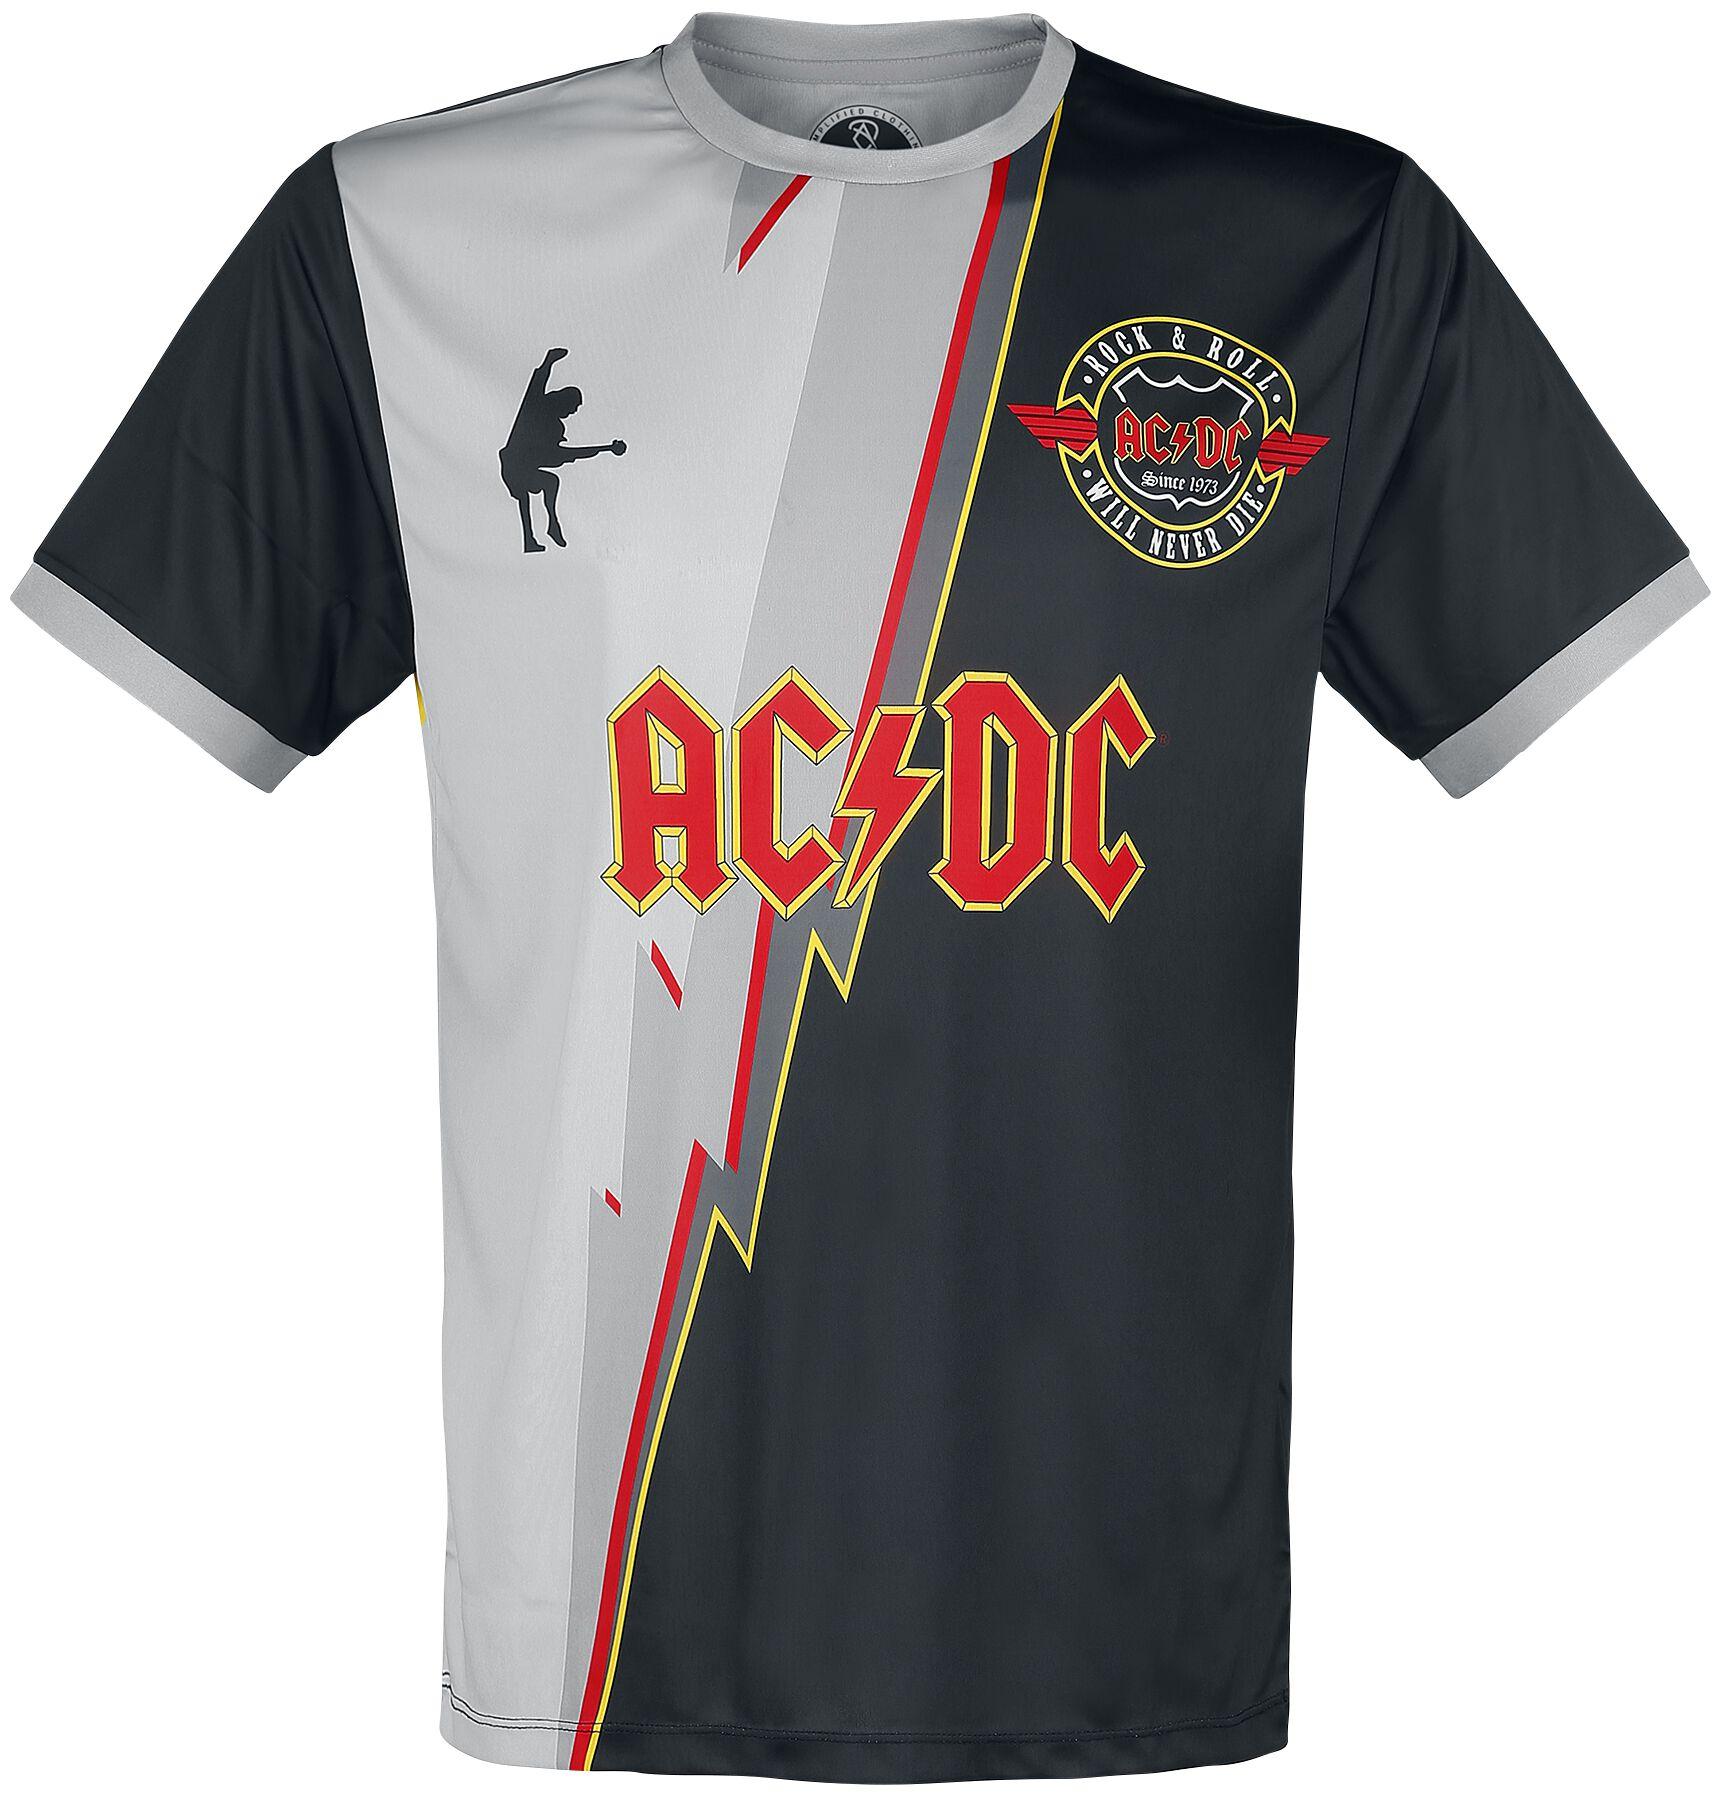 Image of AC/DC Amplified Rock FC - Thunderstruck - Trikot T-Shirt multicolor